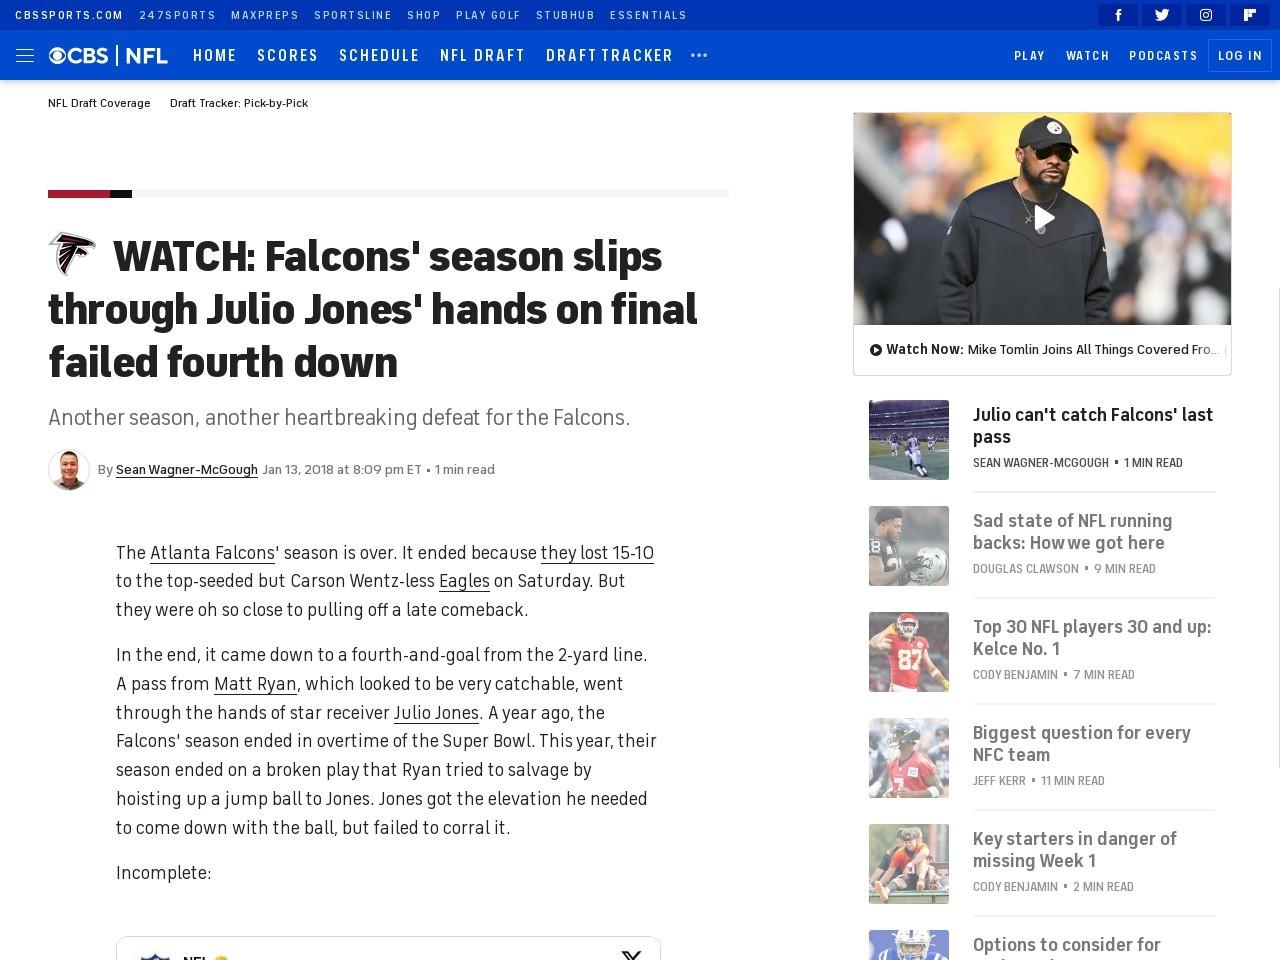 WATCH: Falcons' season slips through Julio Jones' hands on final failed fourth down